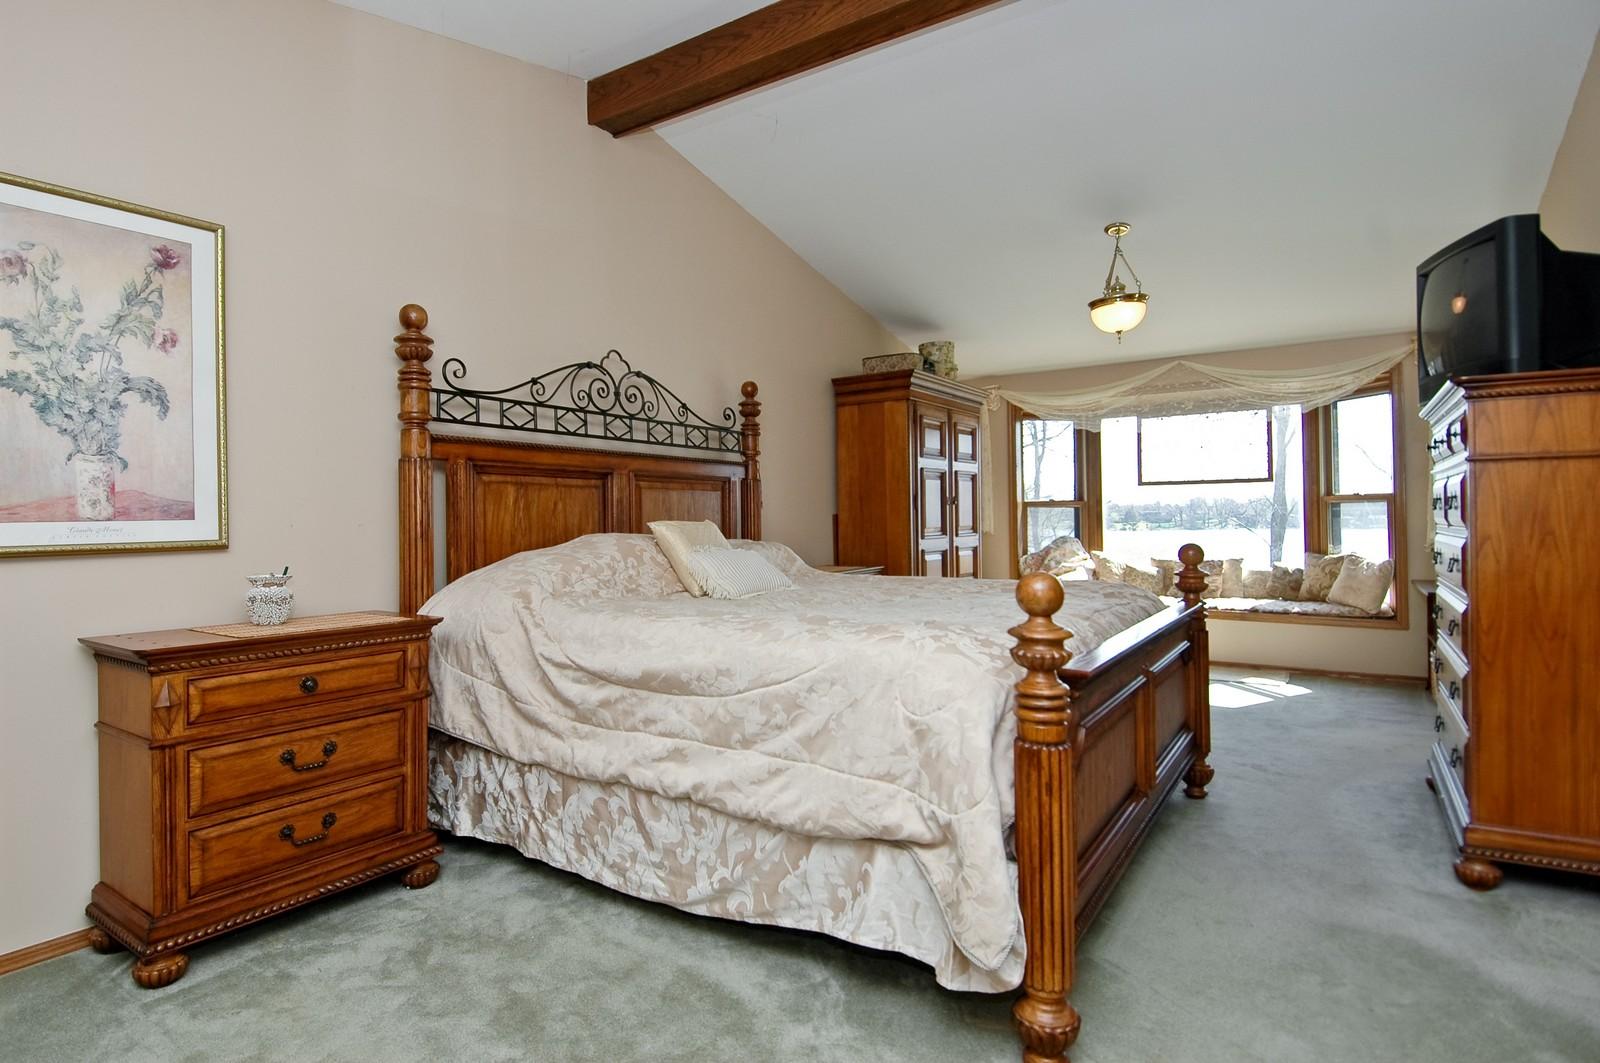 Real Estate Photography - 6106 S Kilkenny, Crystal Lake, IL, 60014 - Master Bedroom